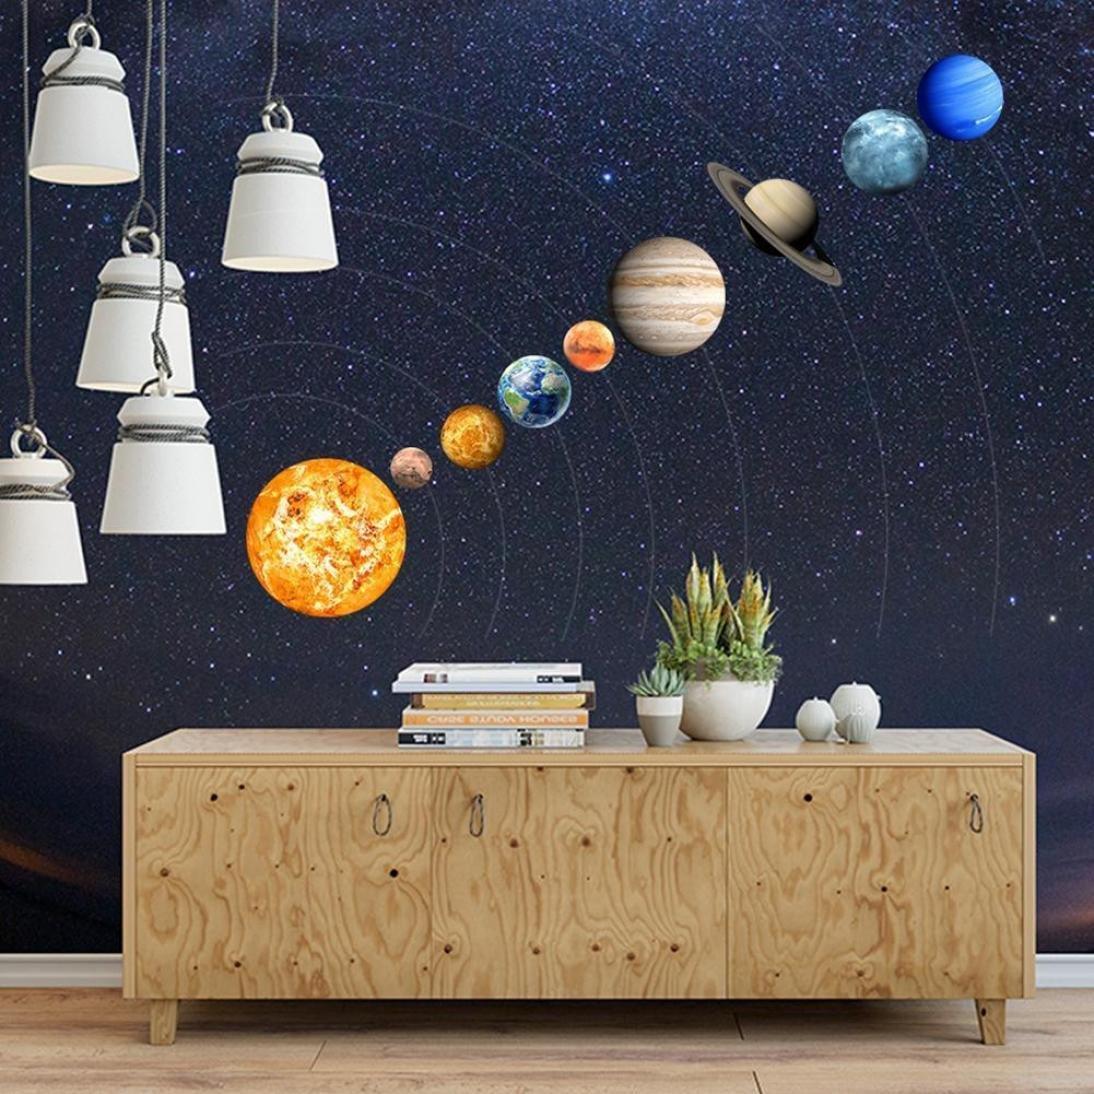 YJYDADA Wall Stickers, Glow In The Dark 30cm Round Planets Star PVC Stickers Kids Ceiling Wall Bedroom by YJYDADA (Image #3)